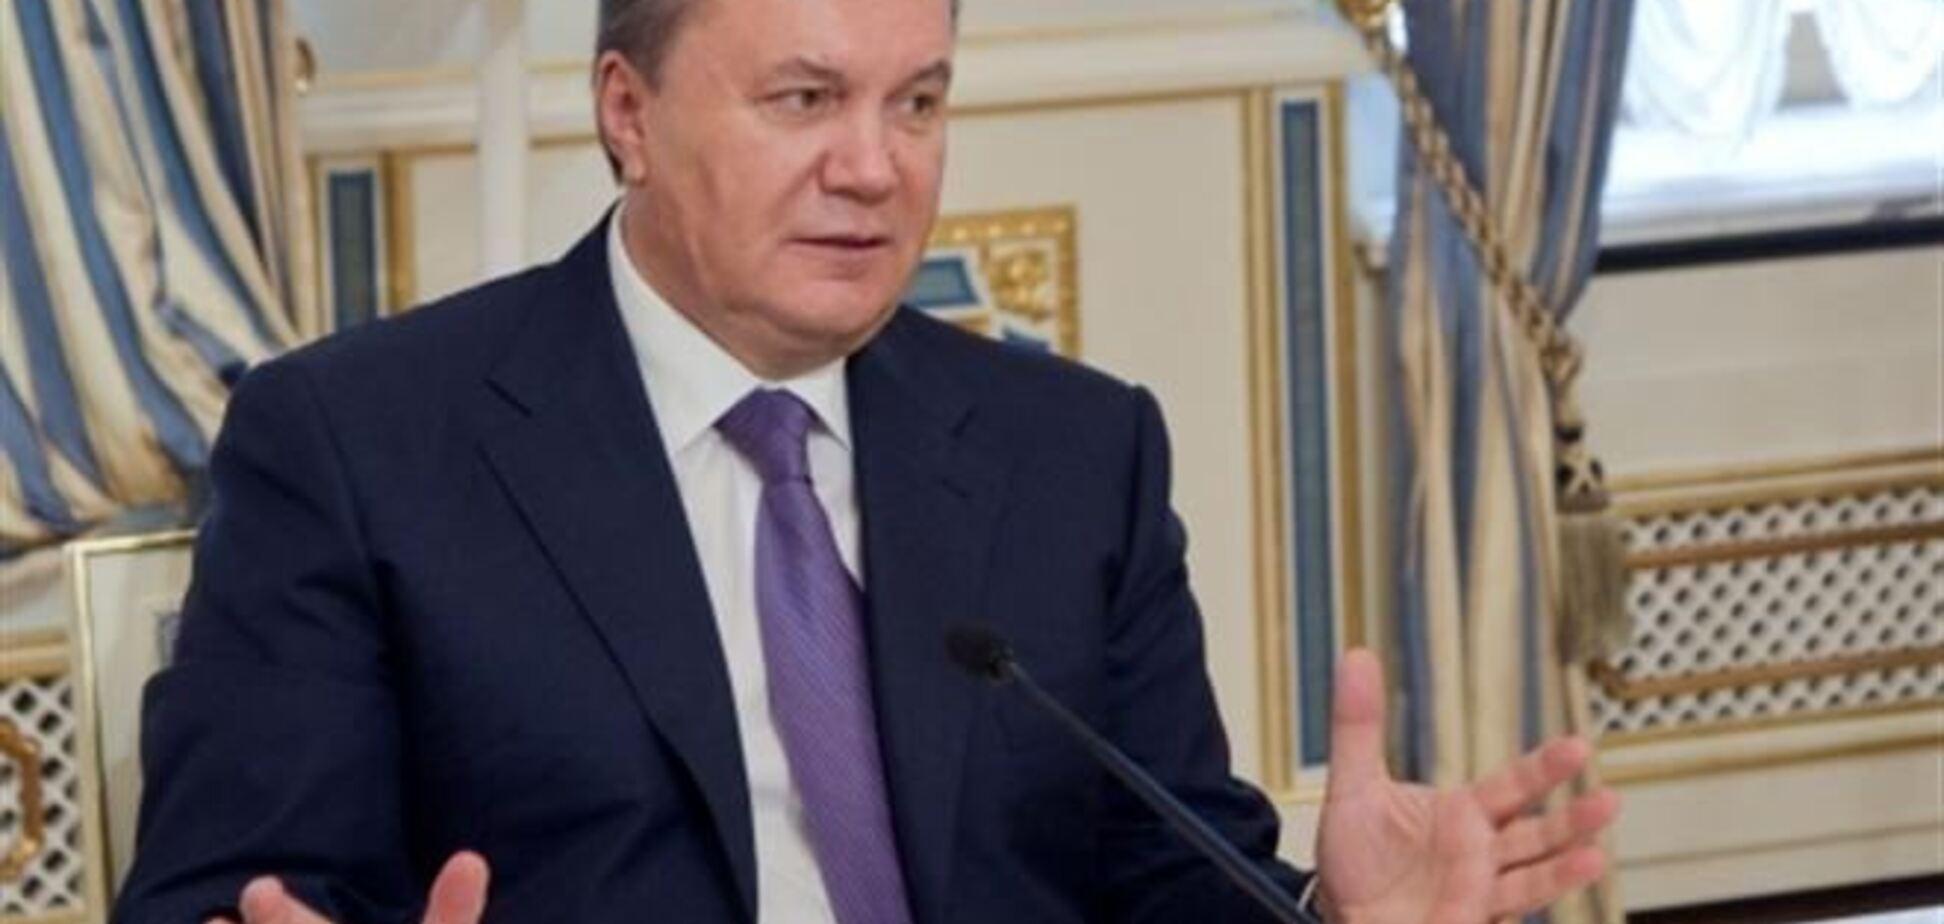 Янукович пообещал освободить арестованных за штурм Банковой